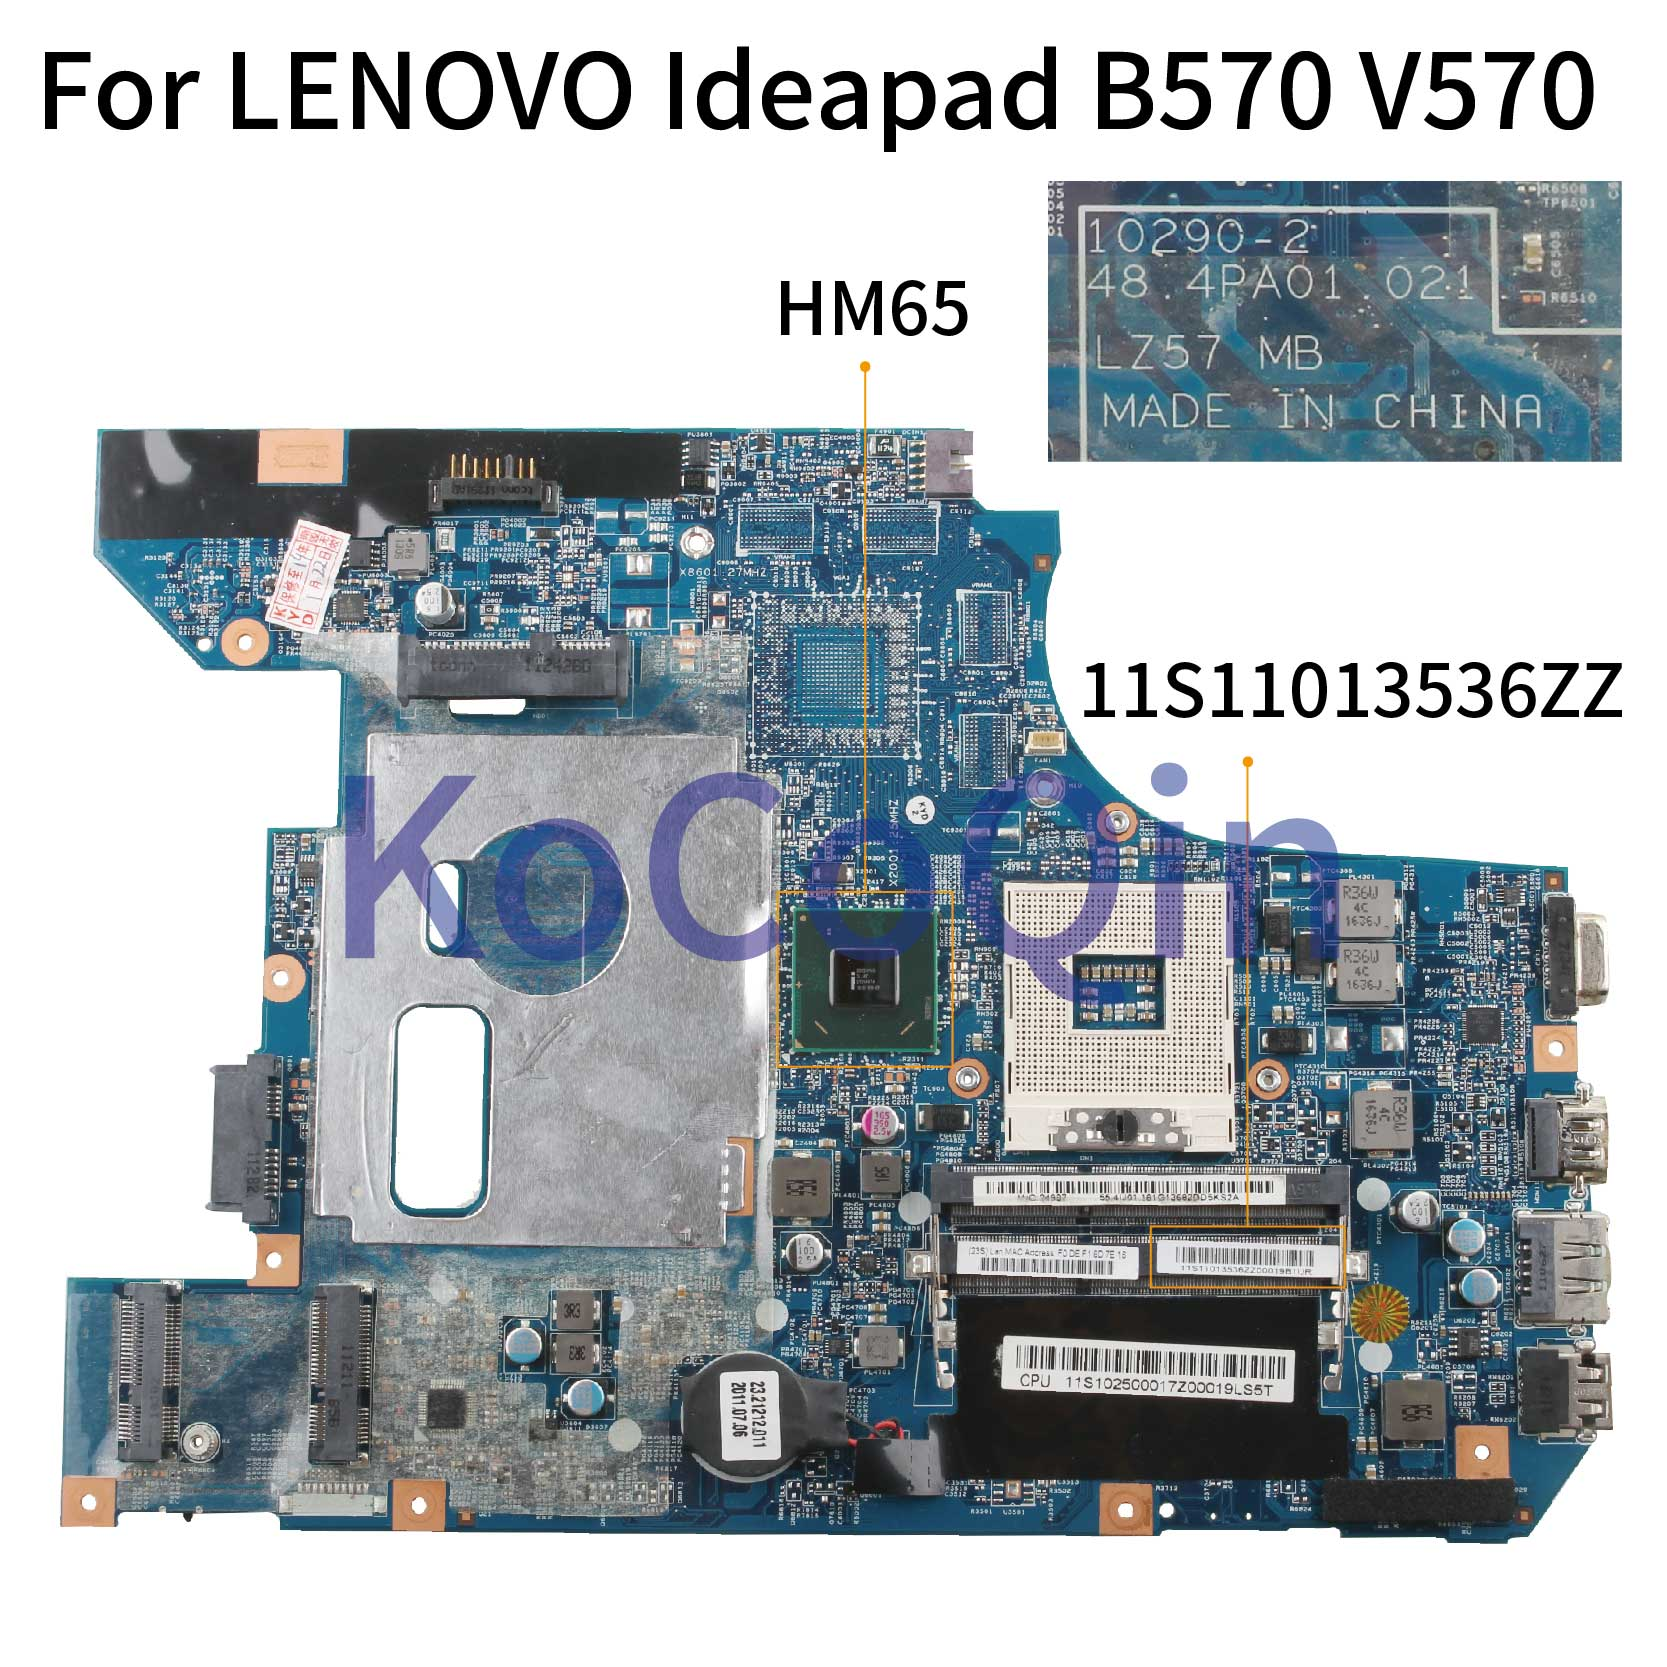 KoCoQin Laptop Motherboard For LENOVO Ideapad B570 V570 Mainboard 10290-2 48.4PA01.021 11S11013536ZZ HM65